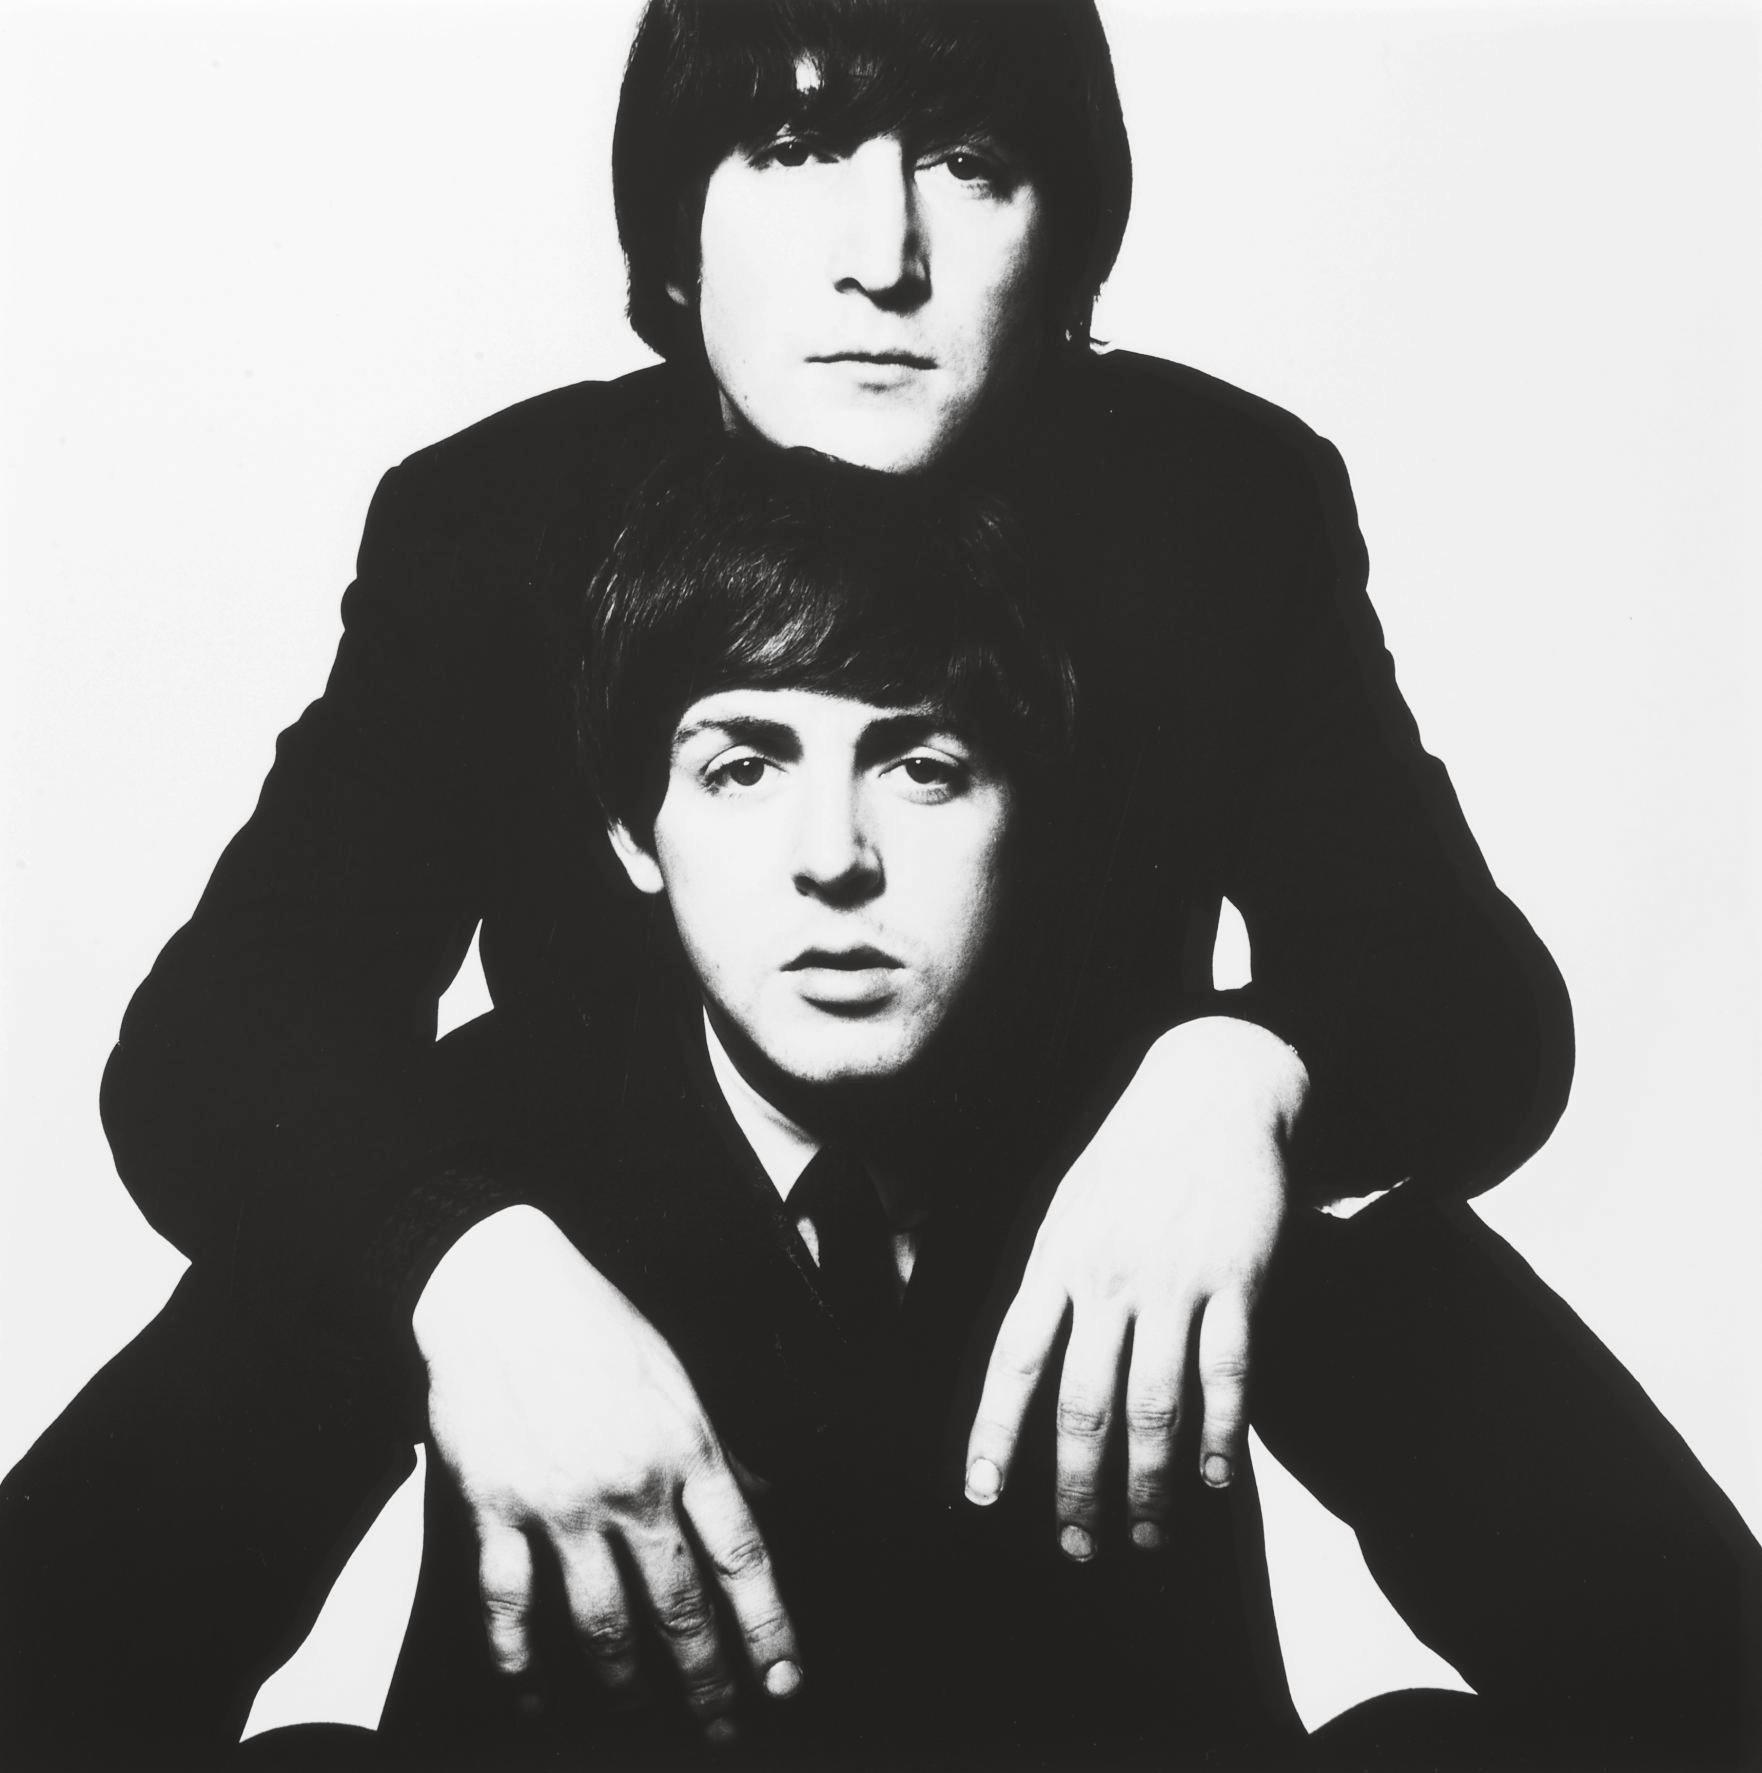 John Lennon and Paul McCartney, January 1965